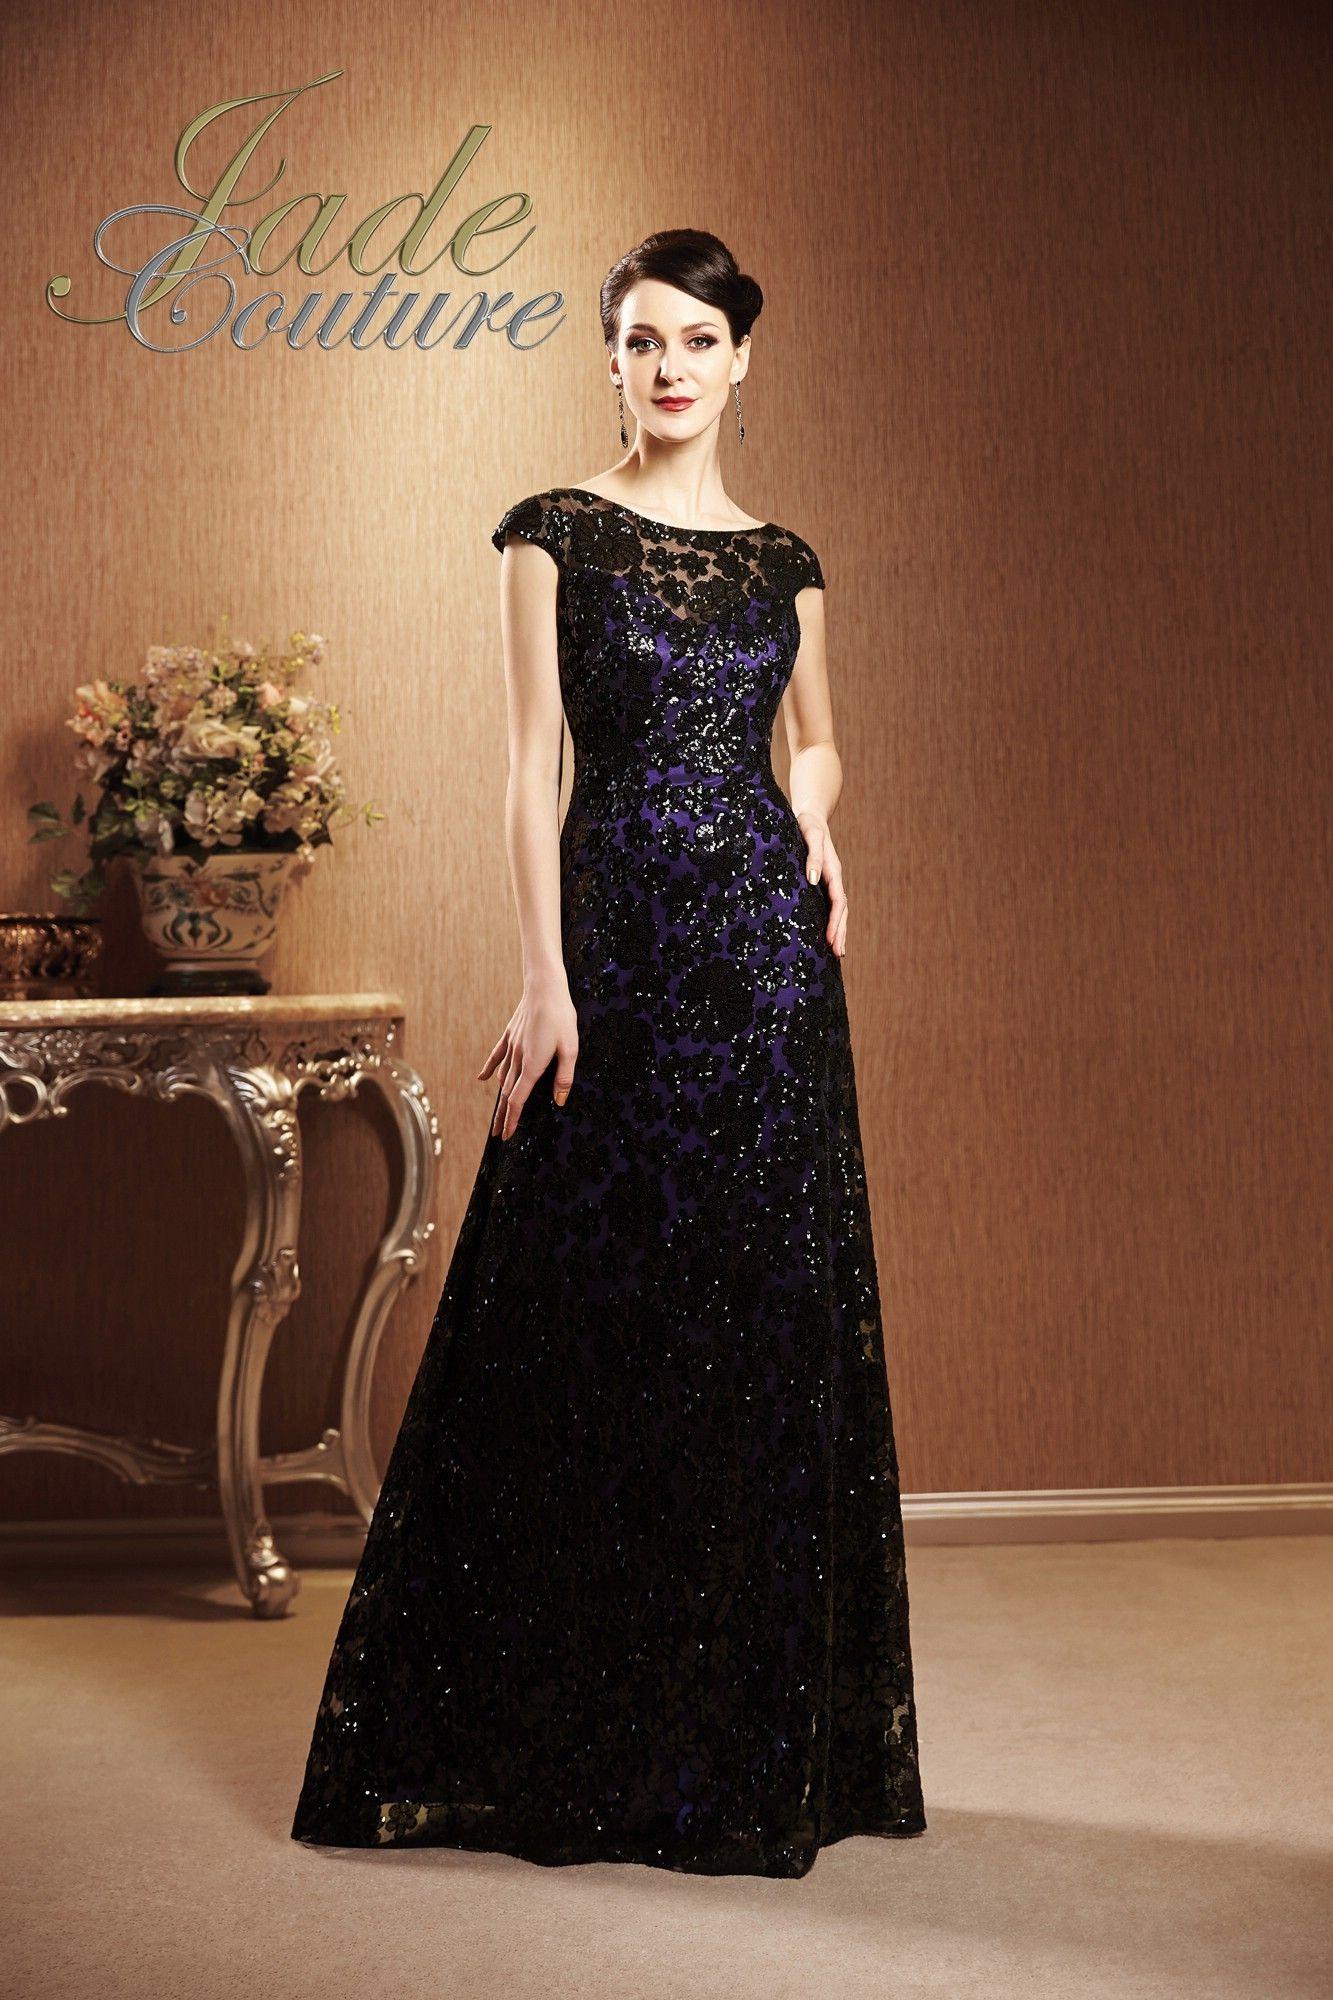 c81fdbed701 Jasmine Jade Couture Mothers Dresses - Style K158064  K158064    Wedding  Dresses